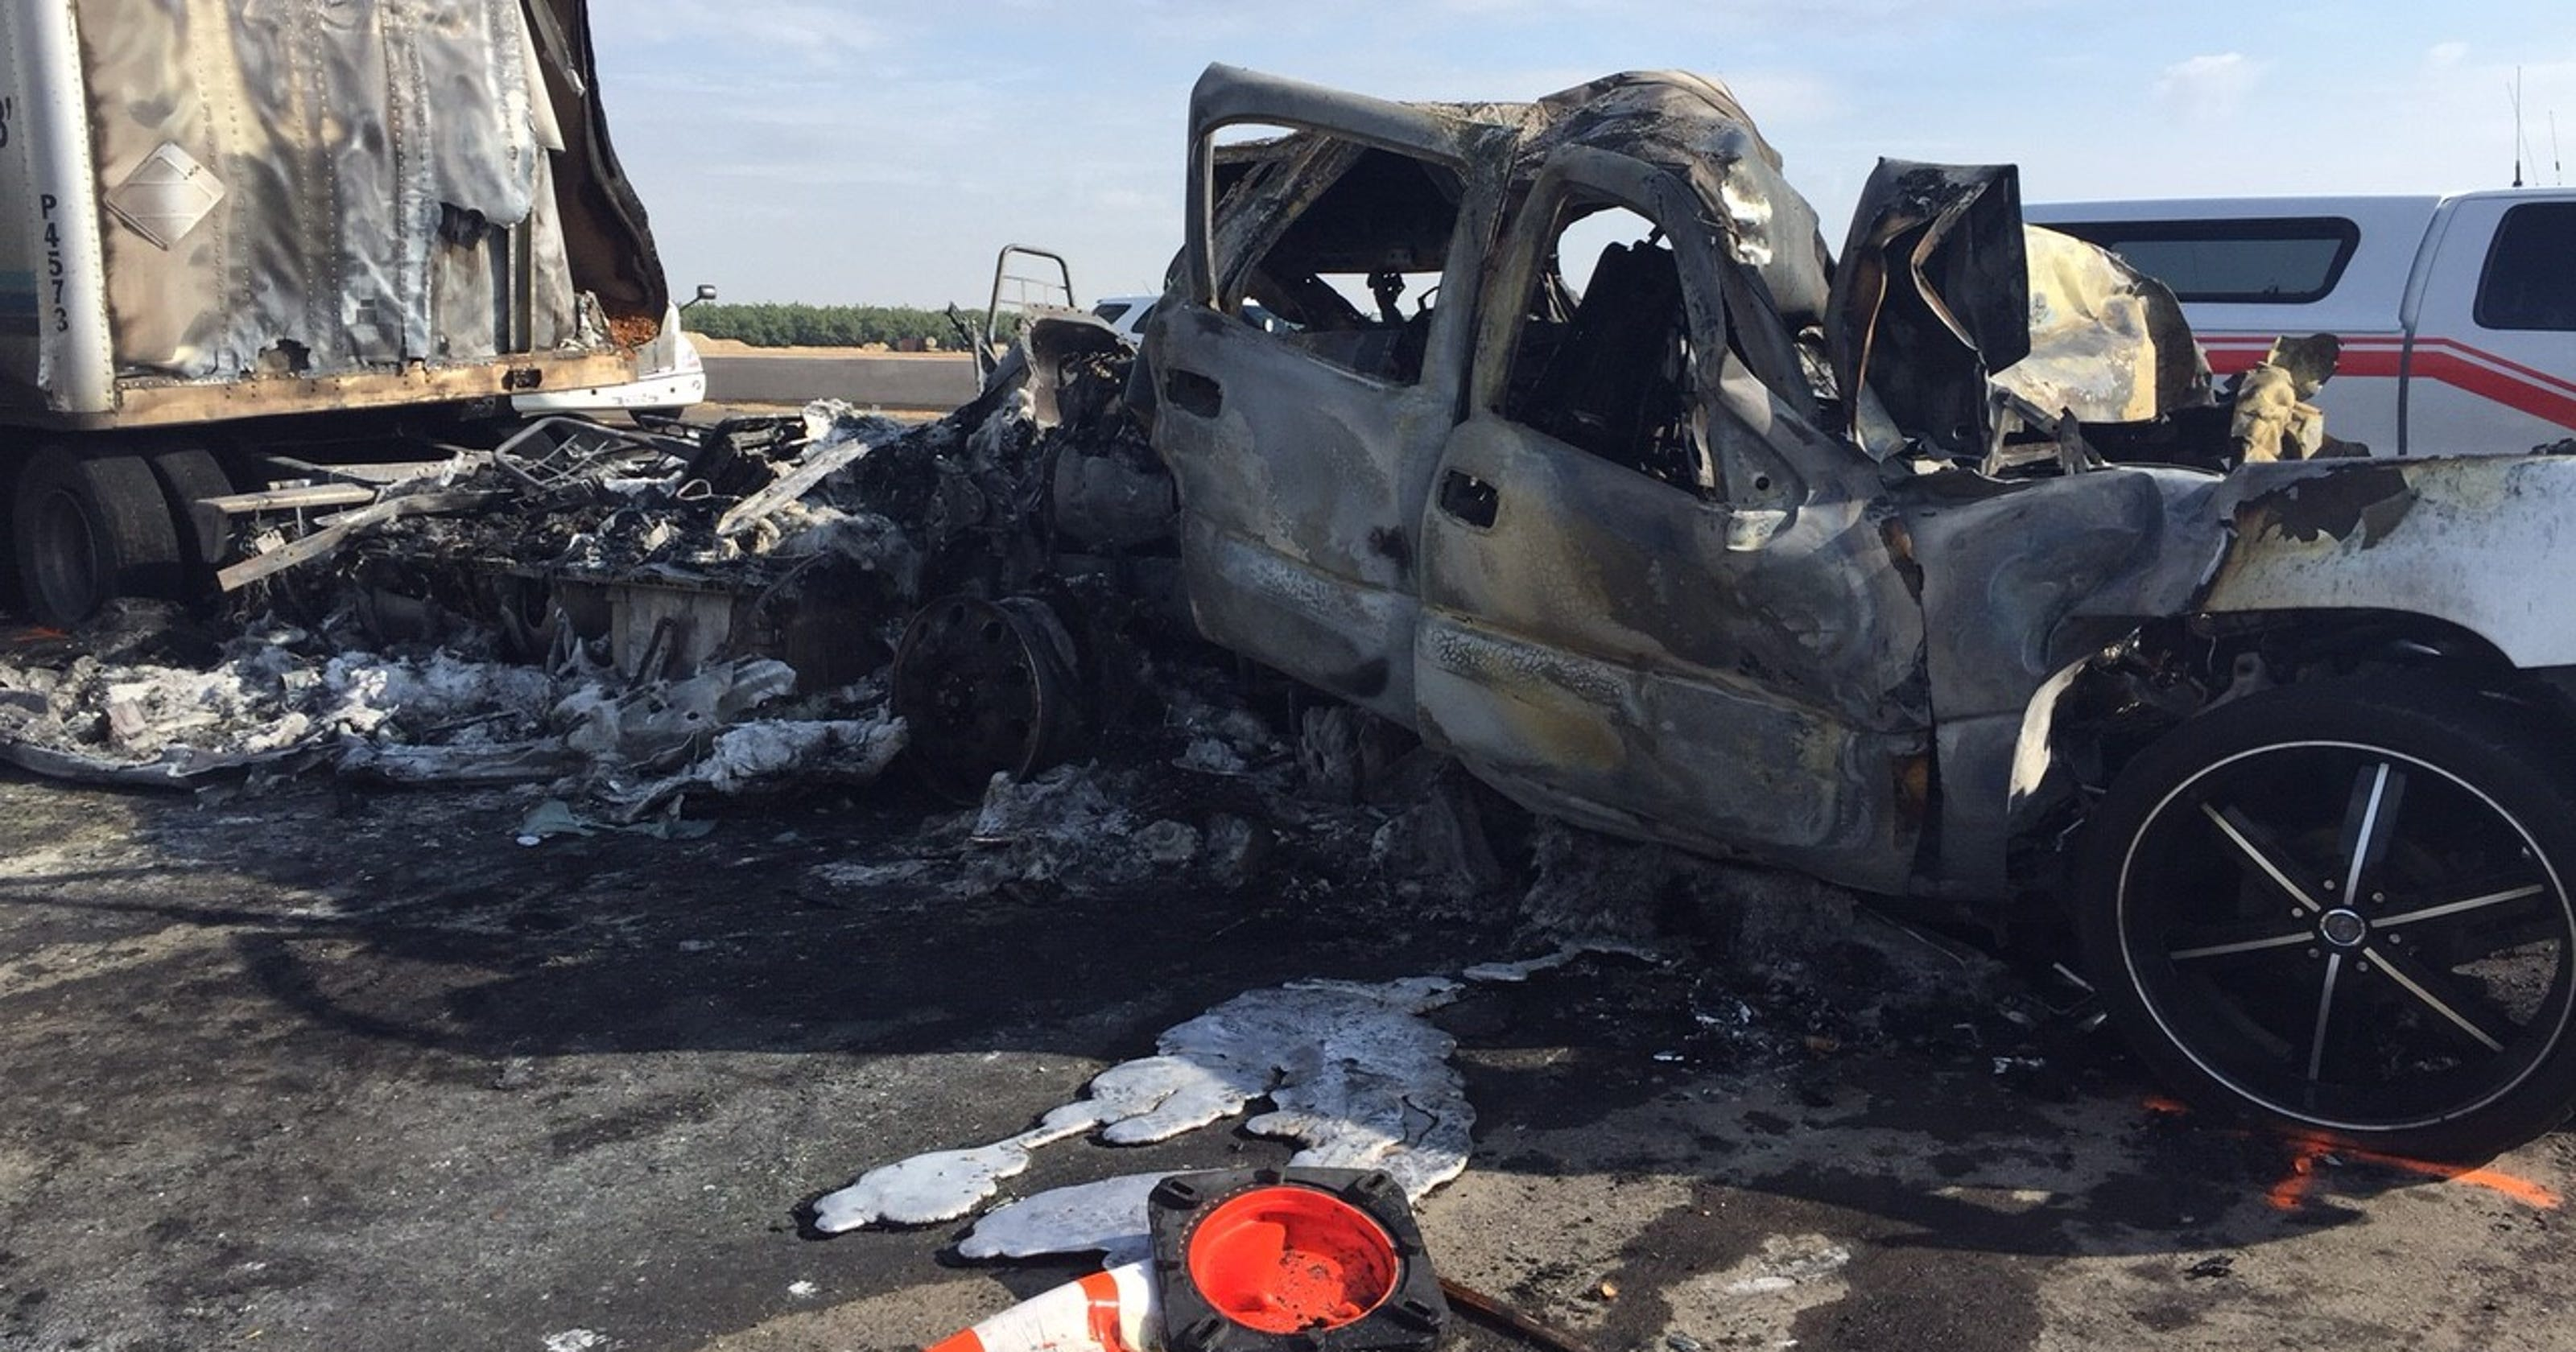 Fatal crash reported on Highway 99